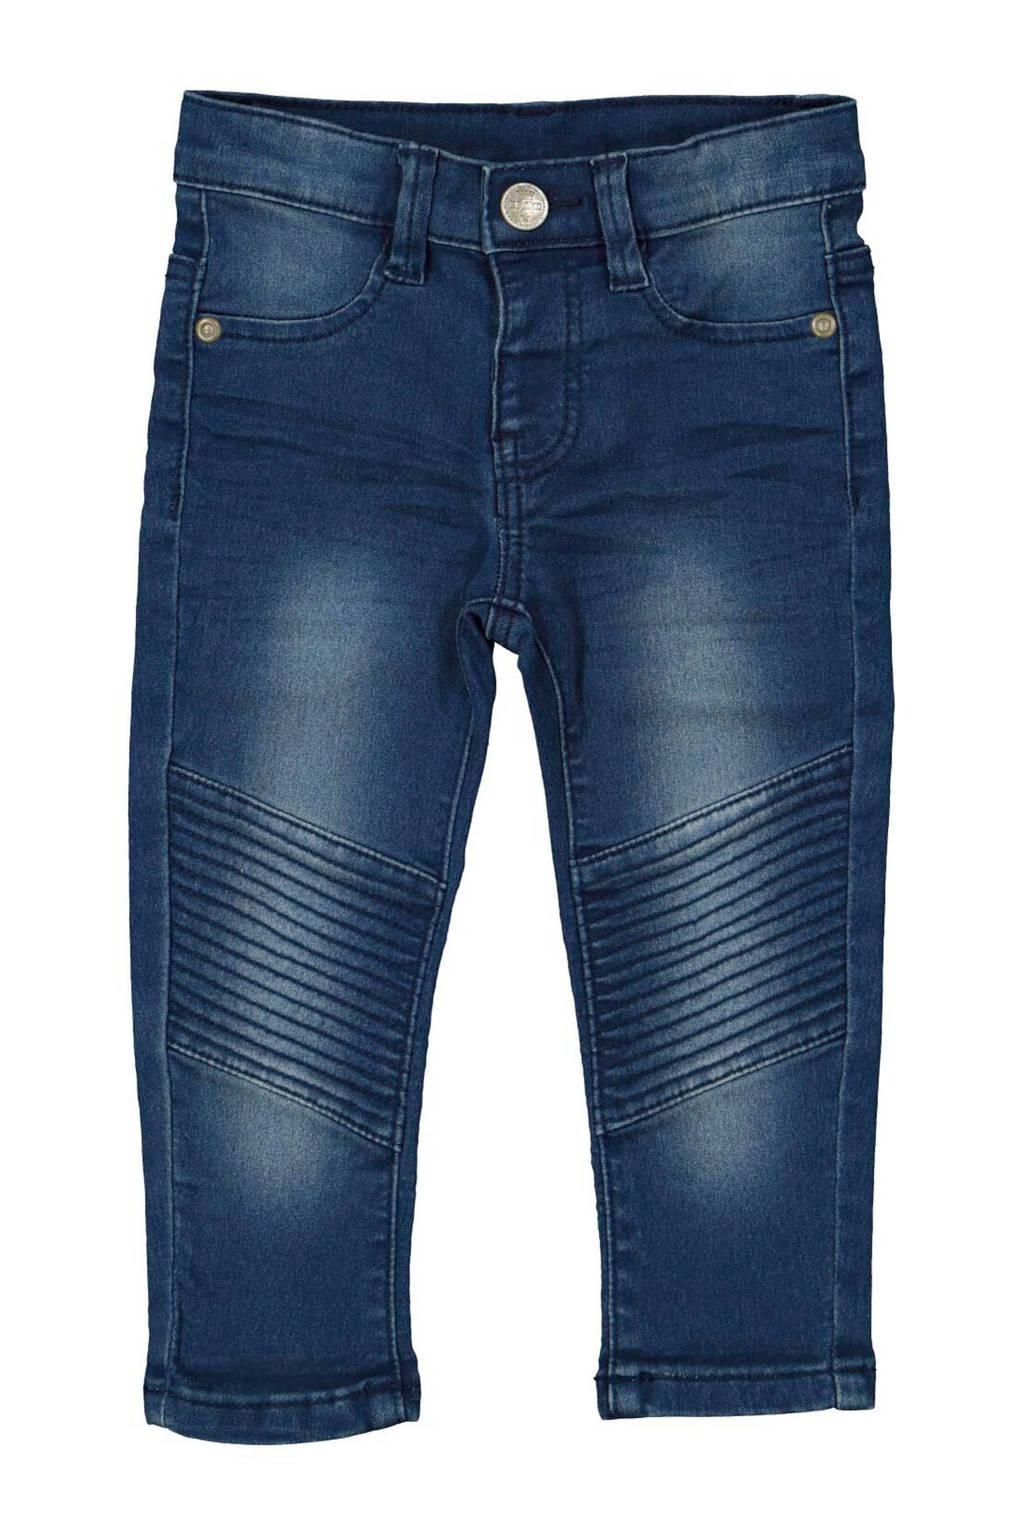 HEMA skinny jeans met textuur denim, Denim